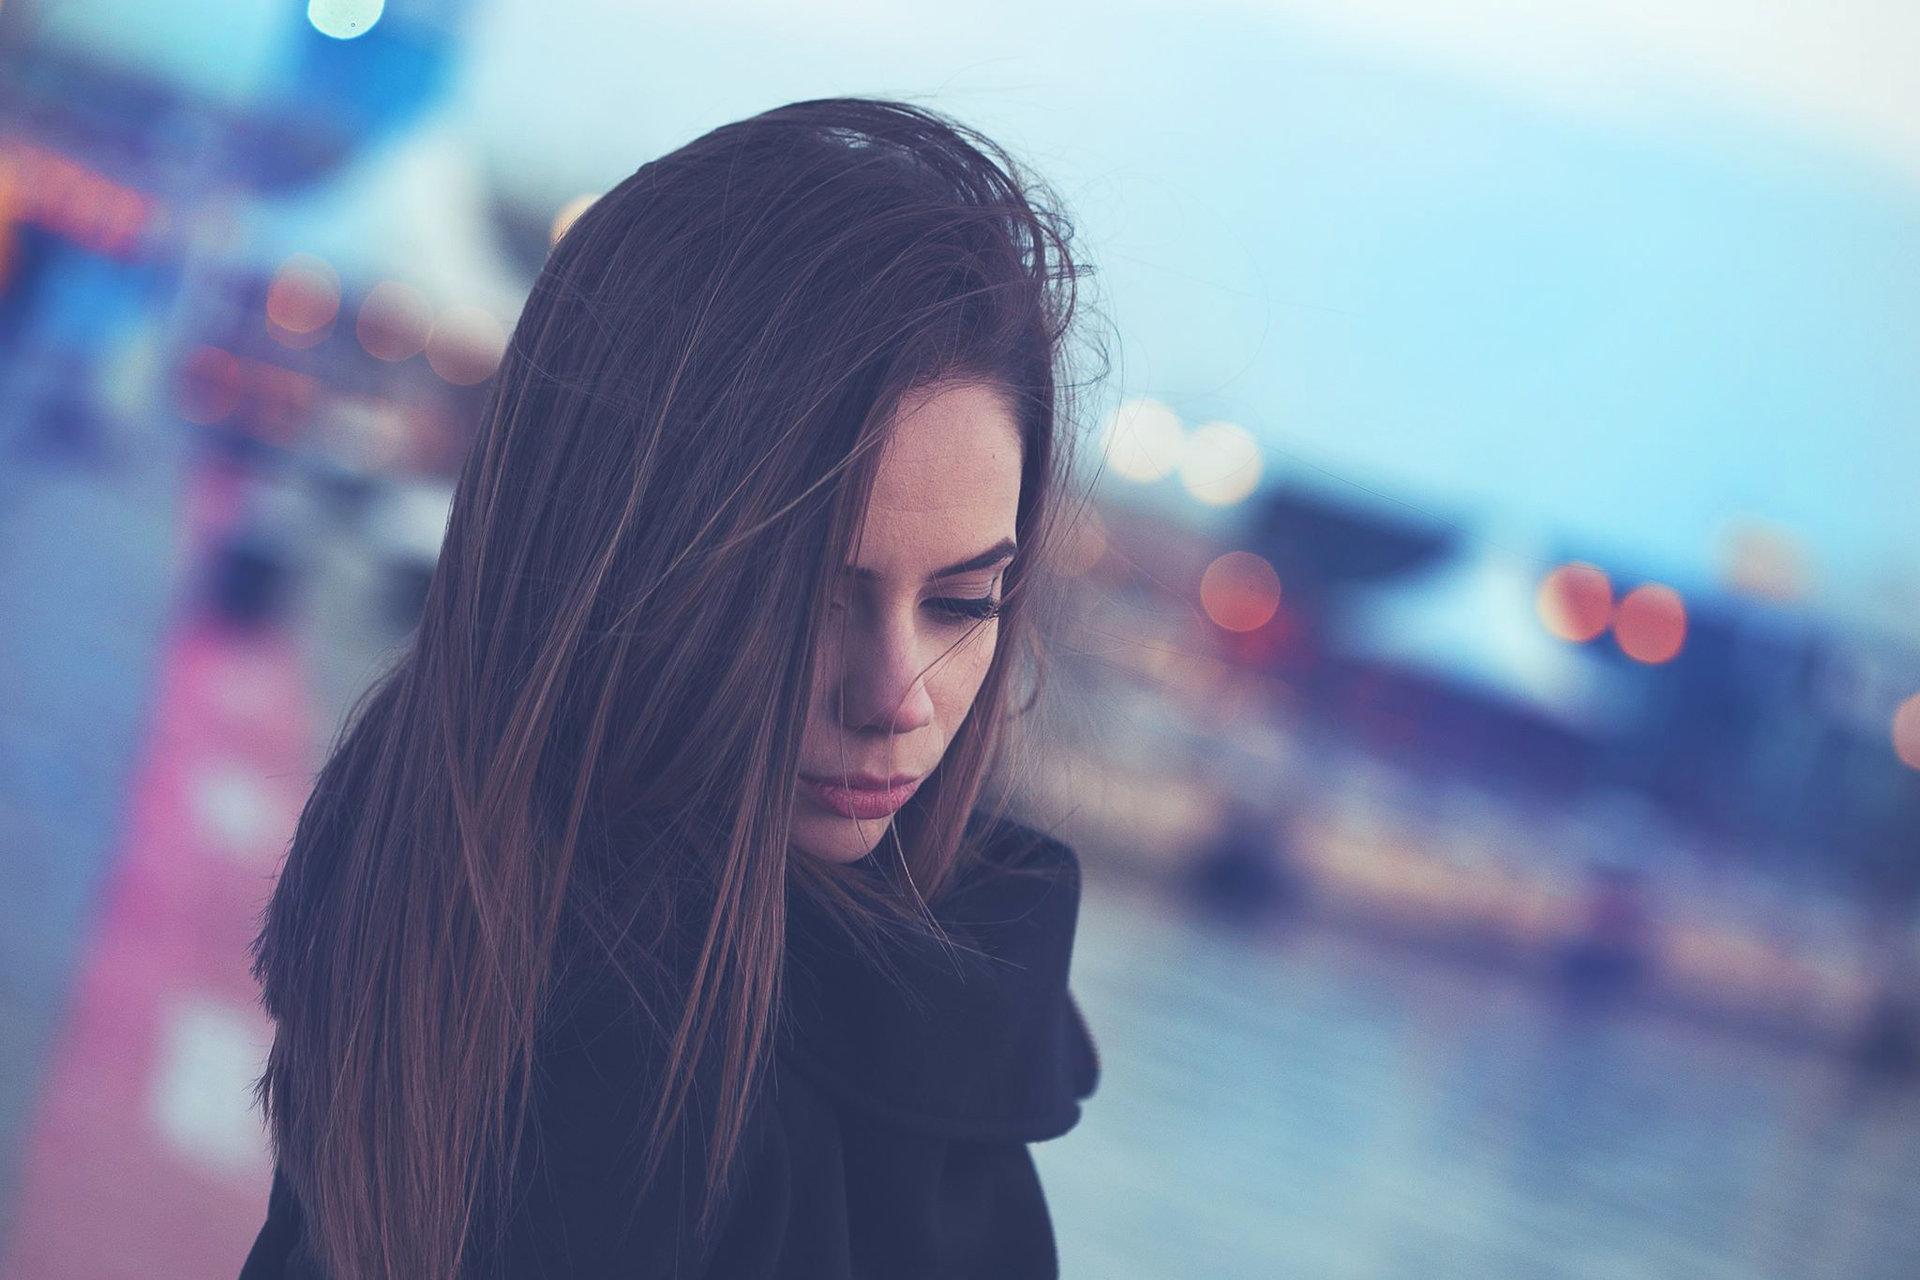 Photo in Portrait | Author ivan_varna | PHOTO FORUM